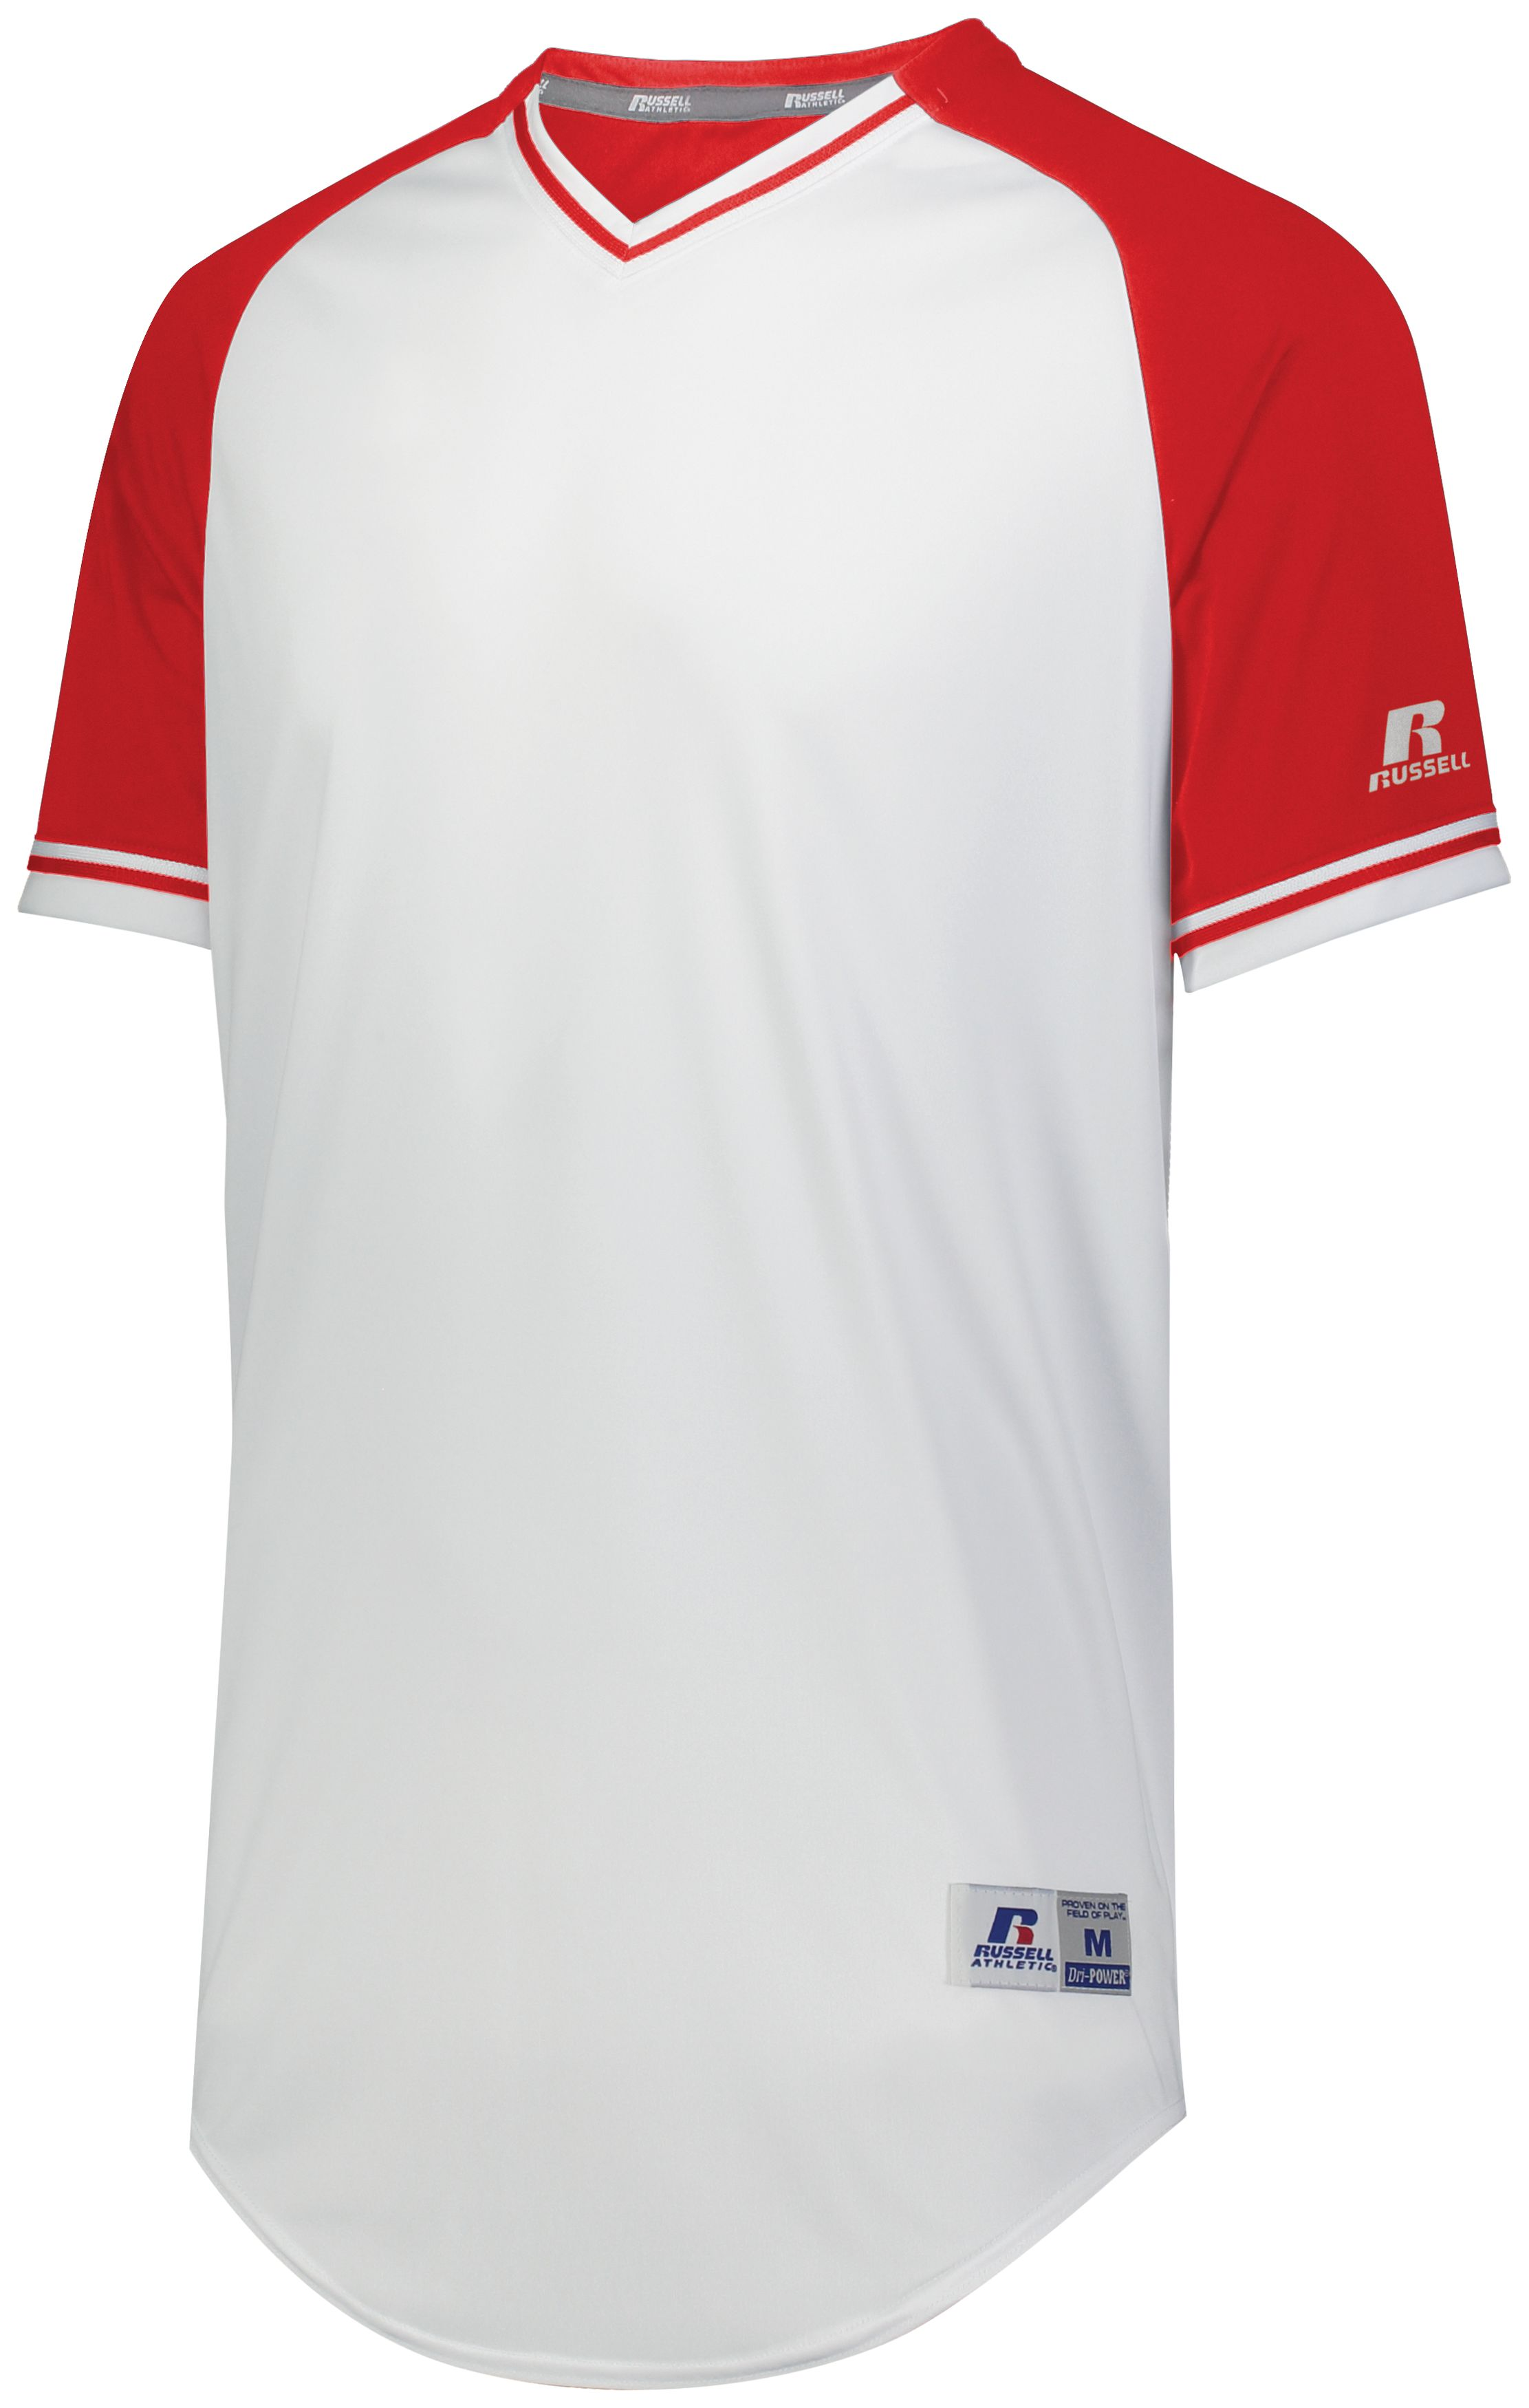 Classic V-Neck Jersey - White/true Red/white